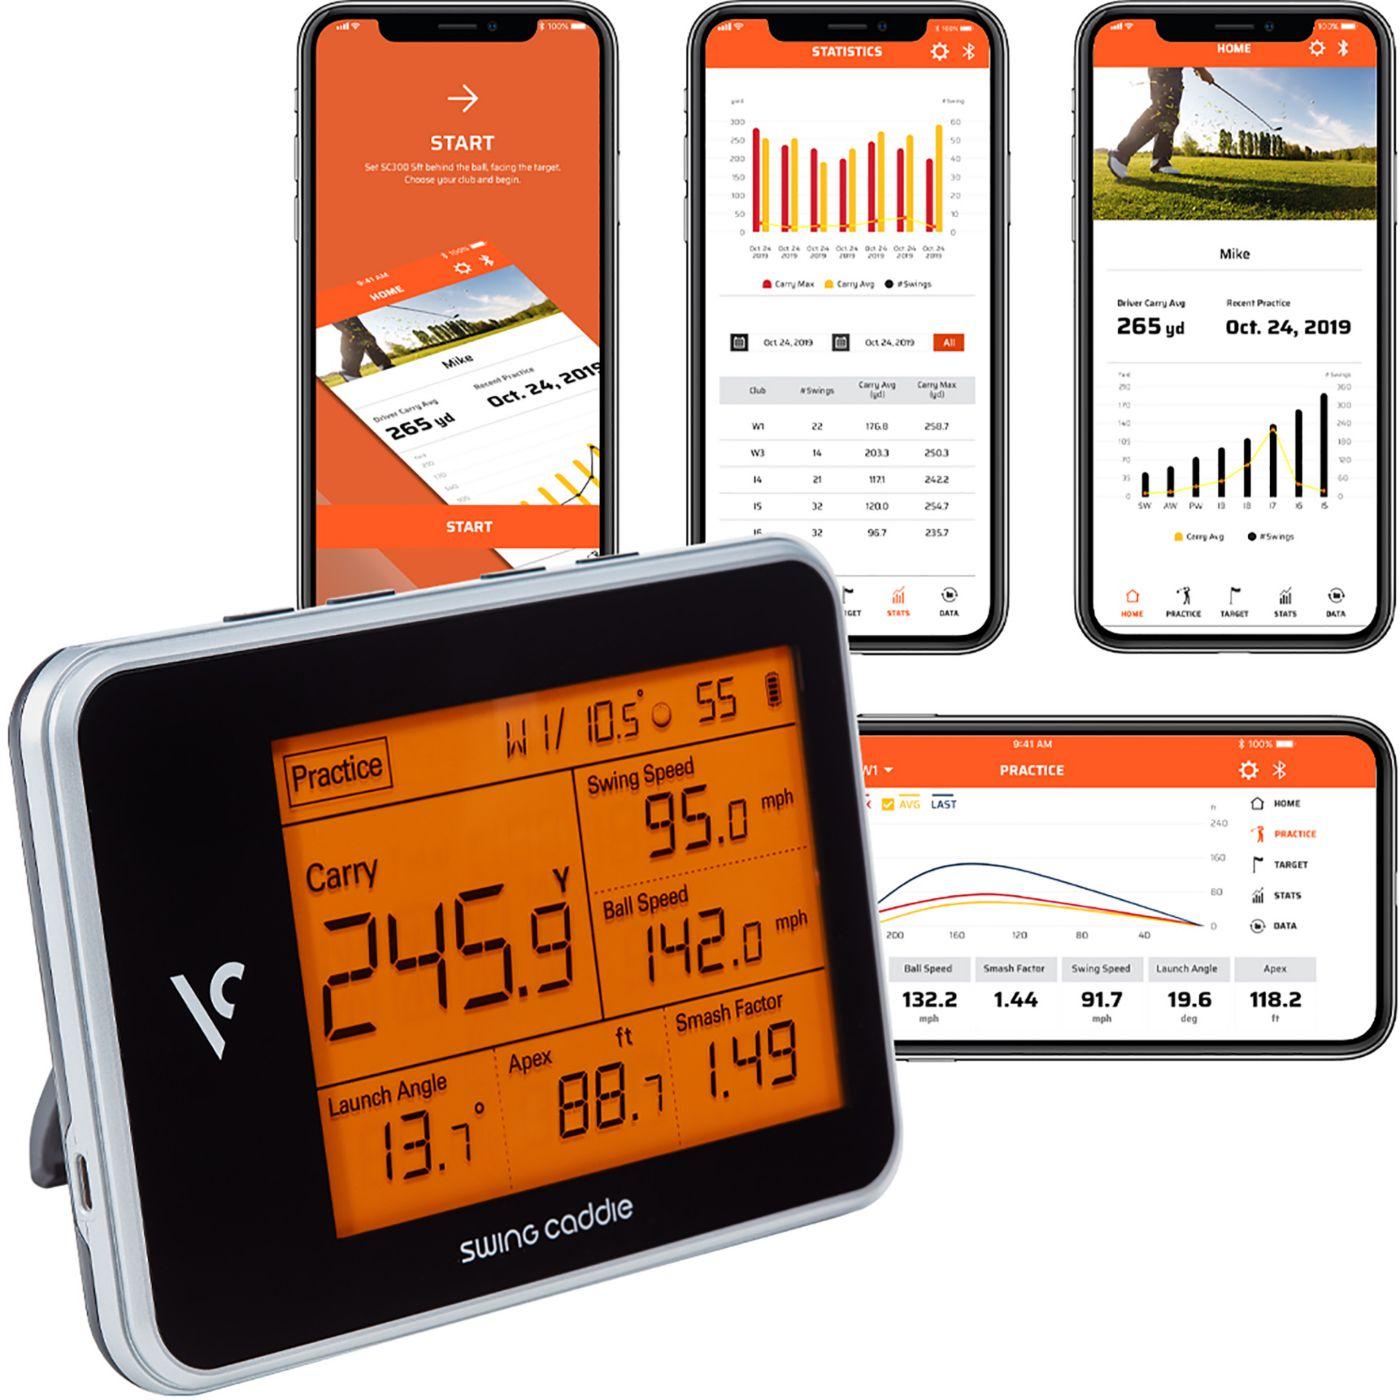 Voice Caddie SC300 Swing Caddie Portable Launch Monitor